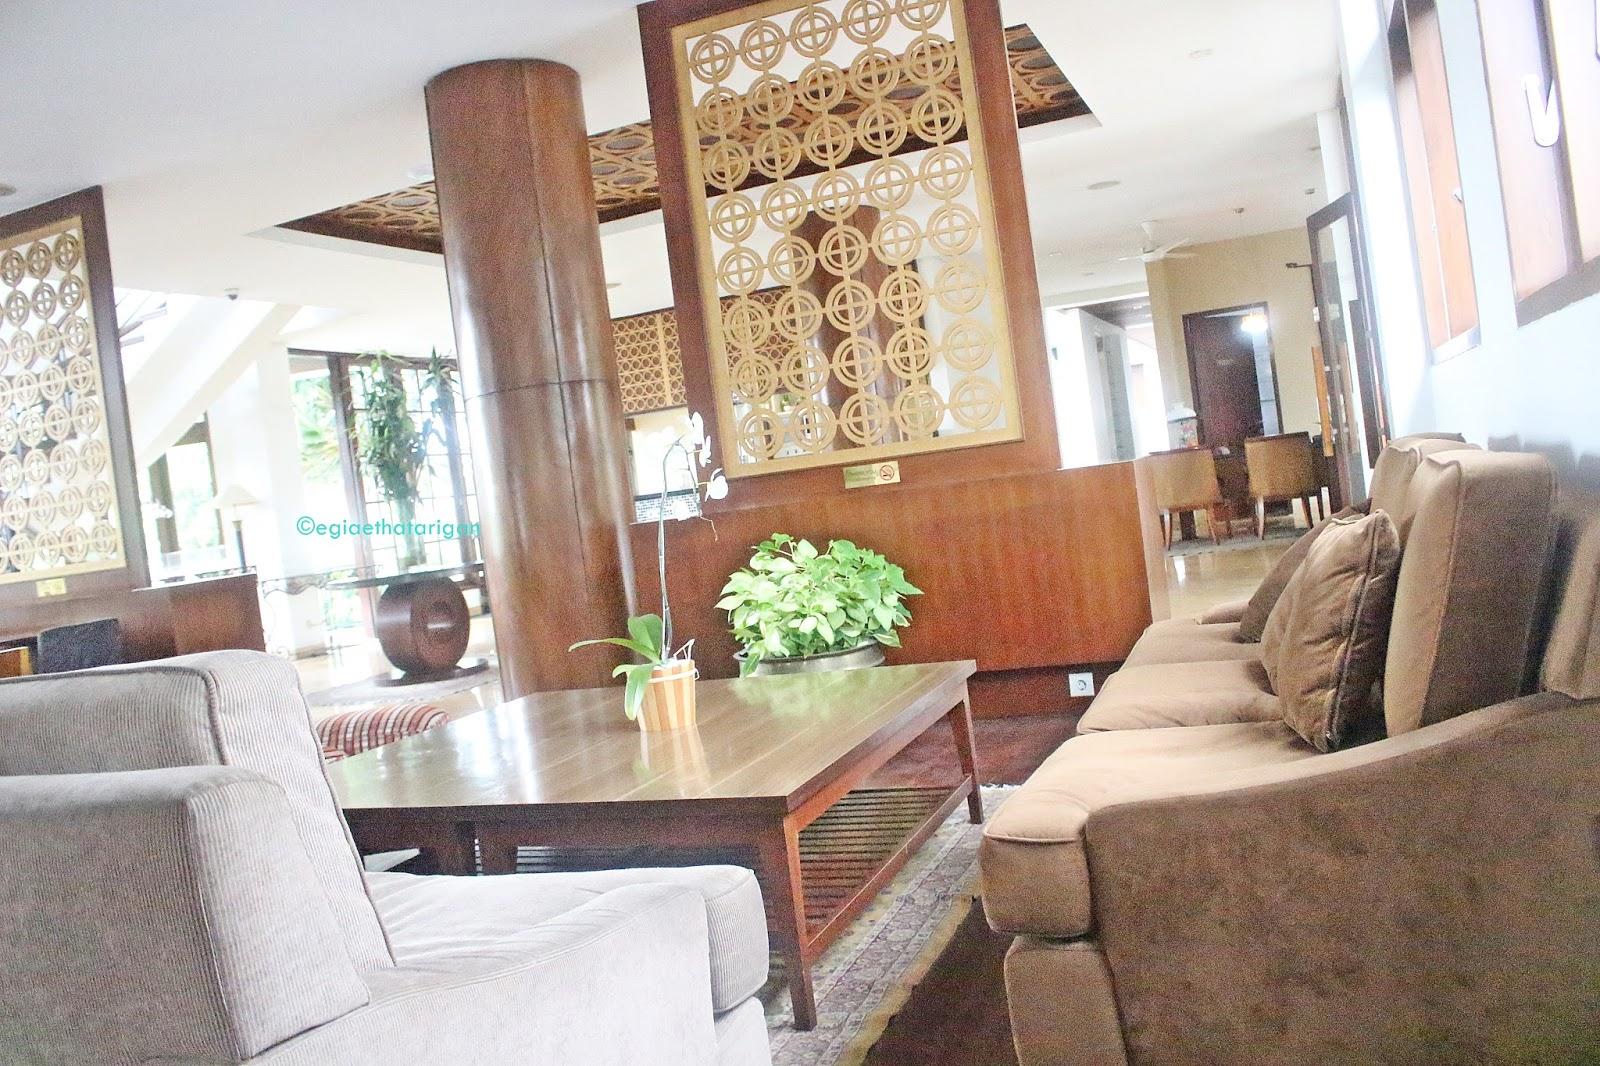 House Sangkuriang Hotel Dago Bandung Dengan Infinity